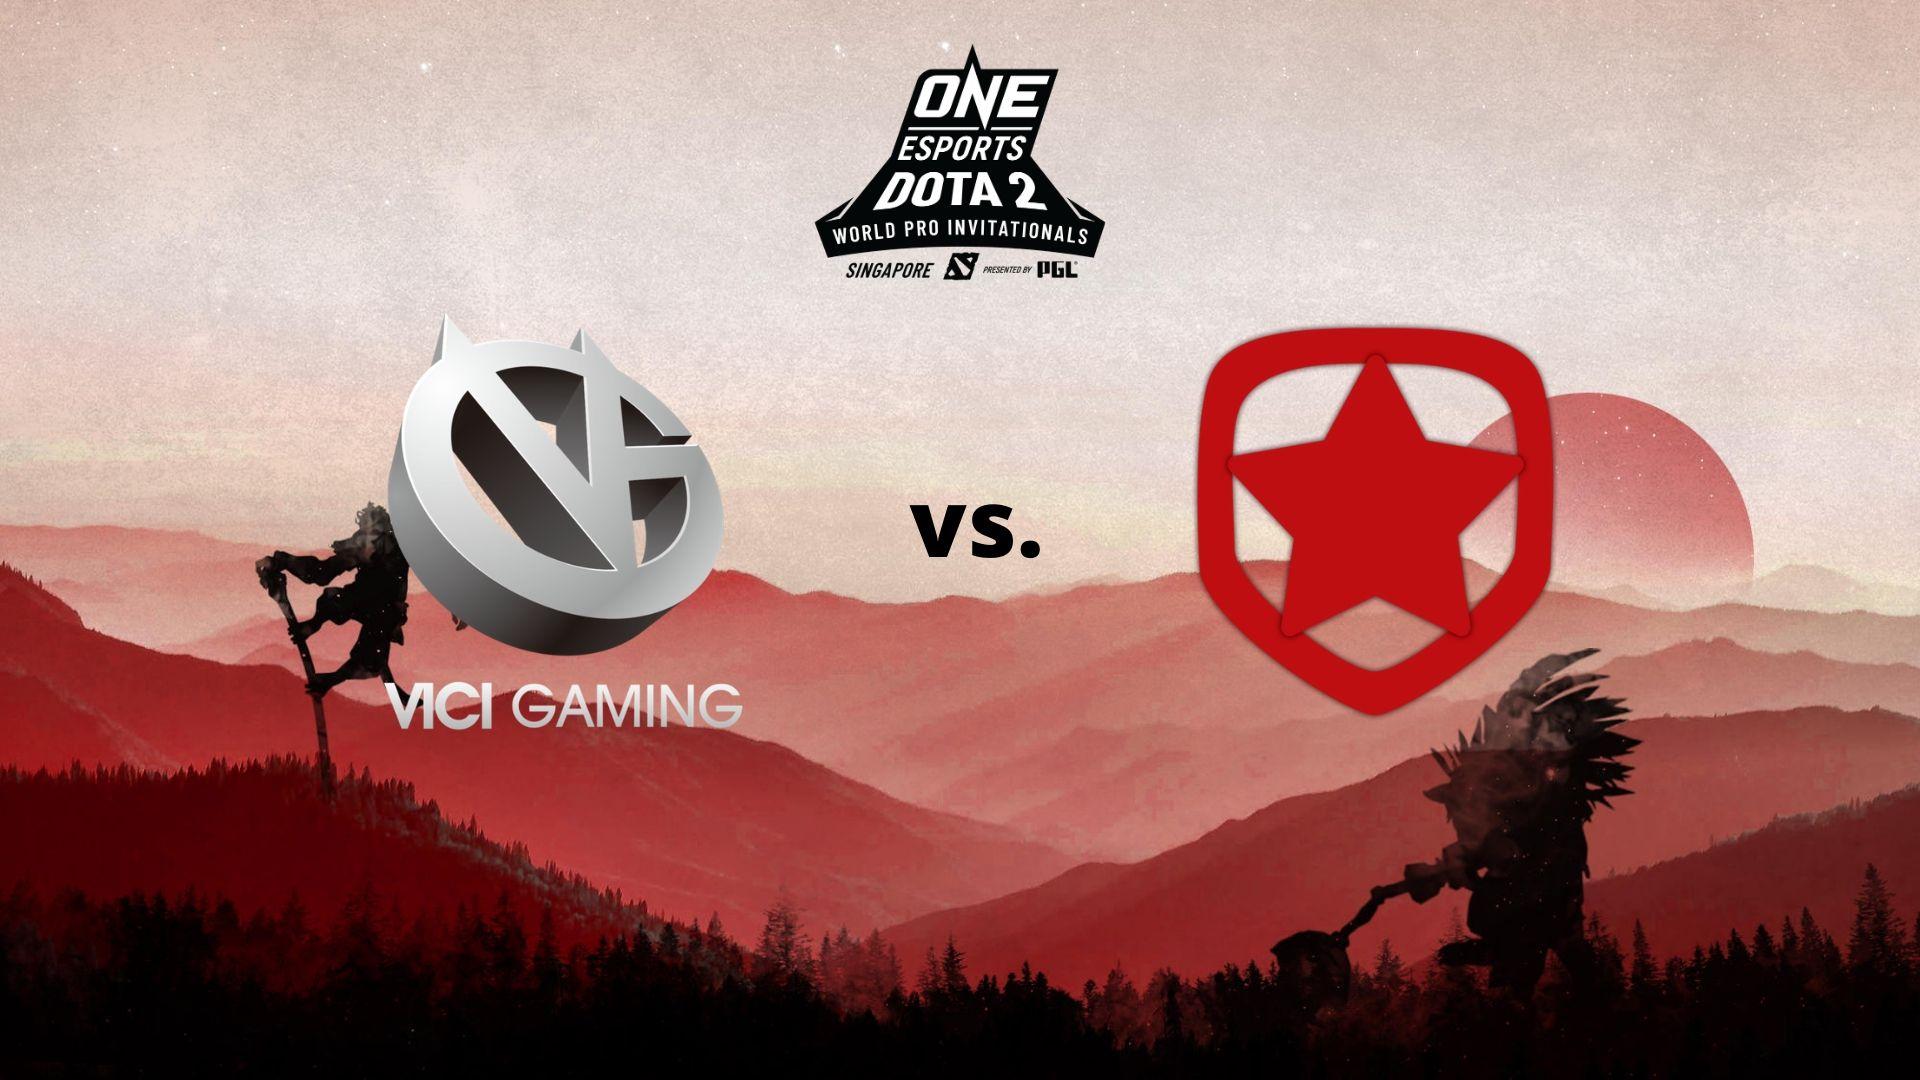 vg vs gambit one esports world pro invitational sg